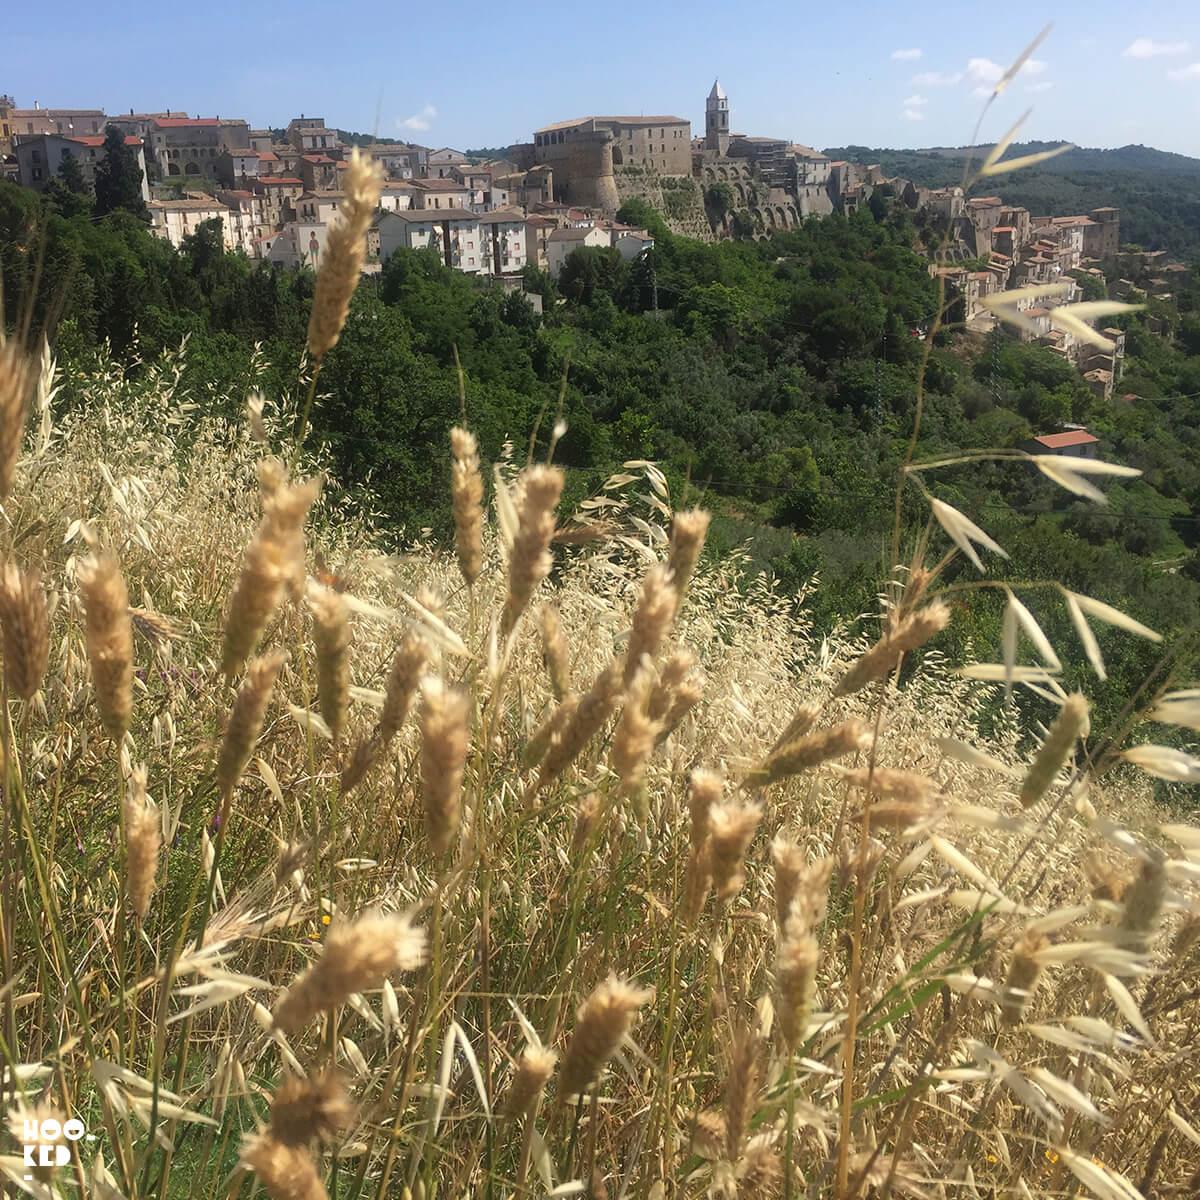 Views of the town of Civitacampomarano, Italy